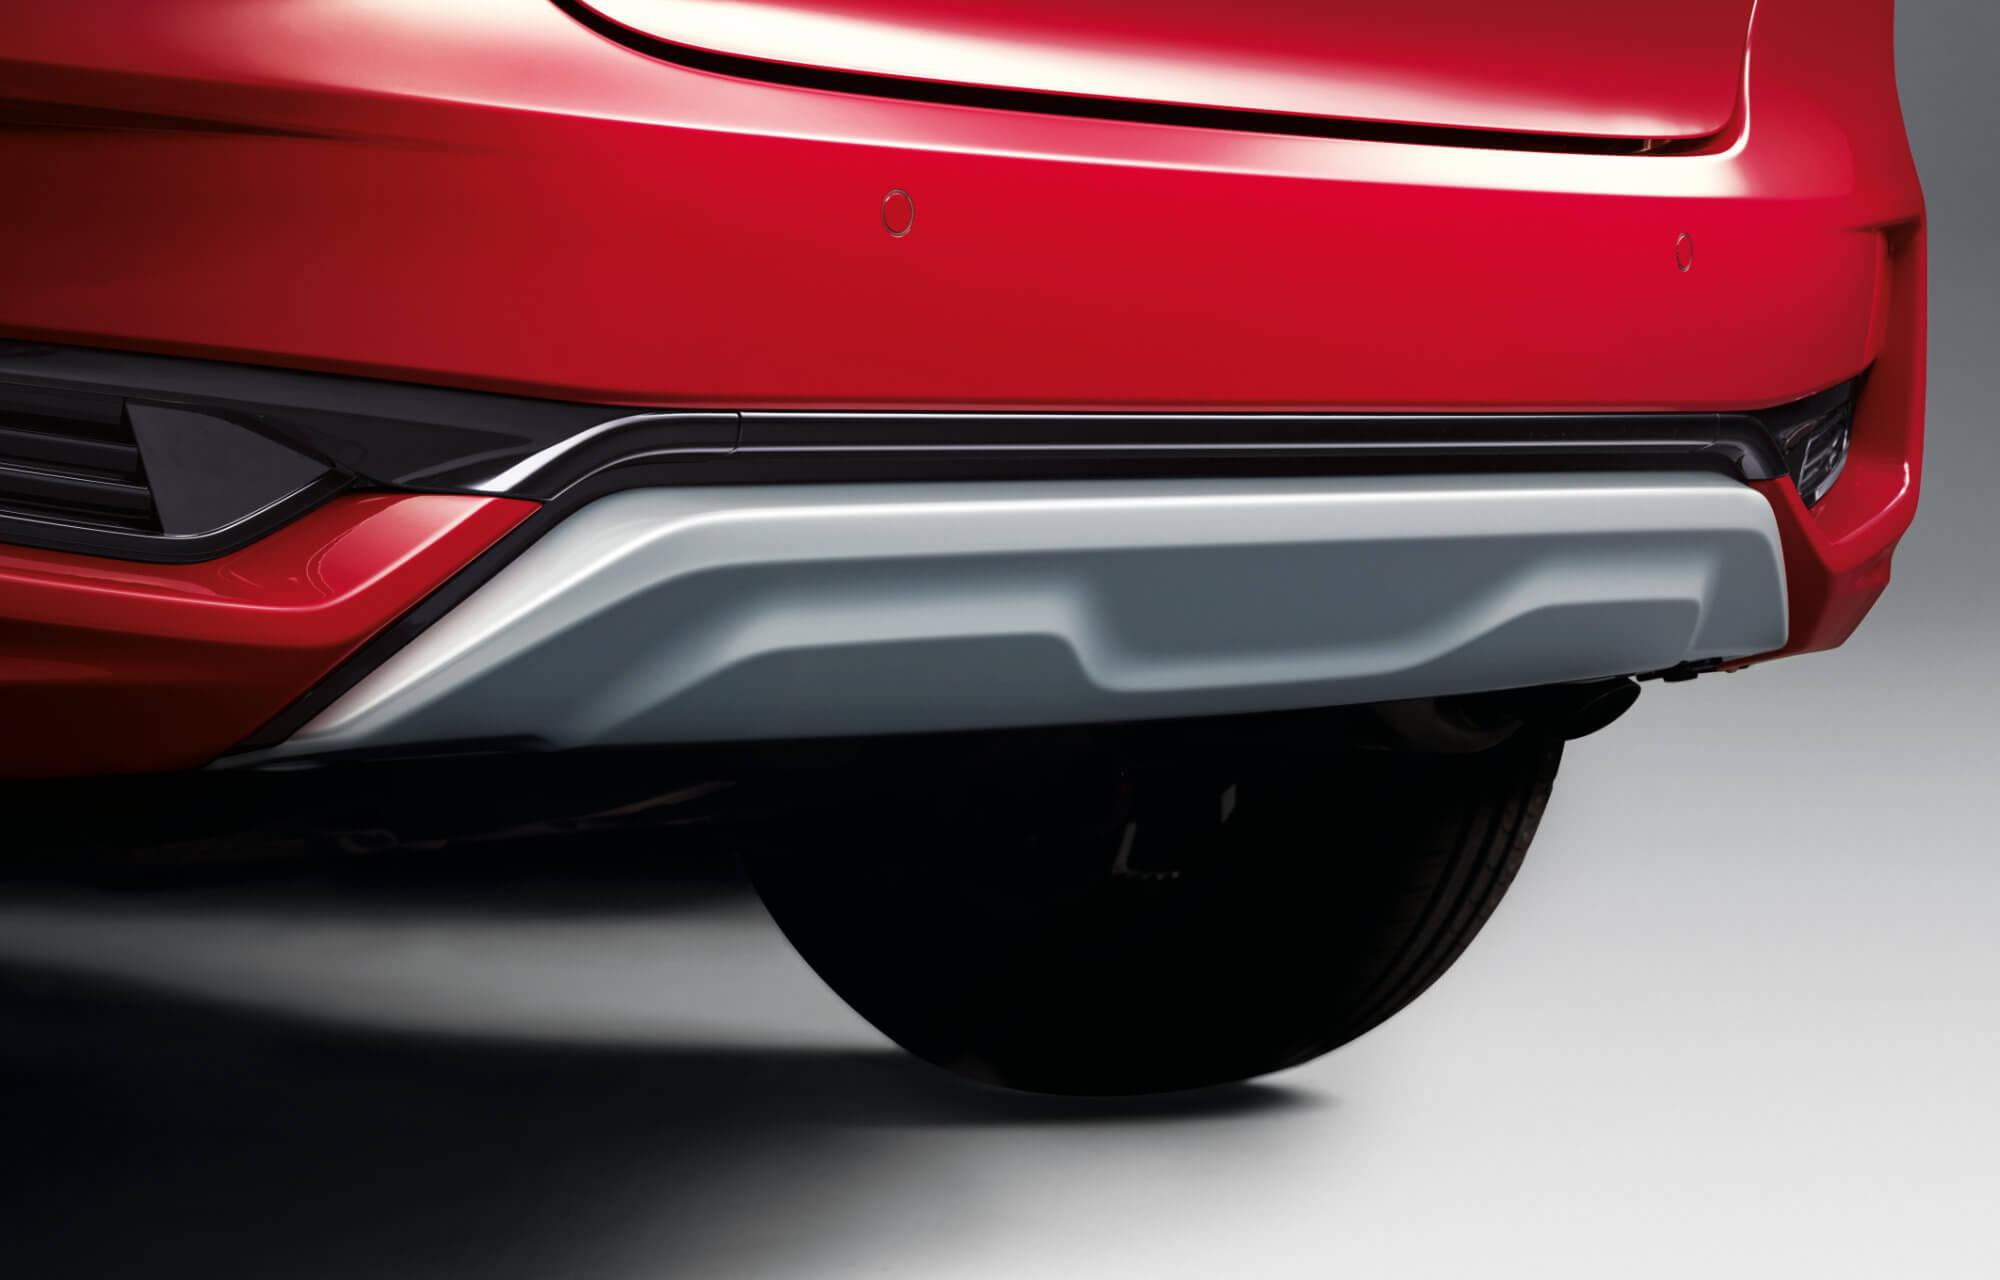 Honda Jazz Rear Lower Decoration - X-Road